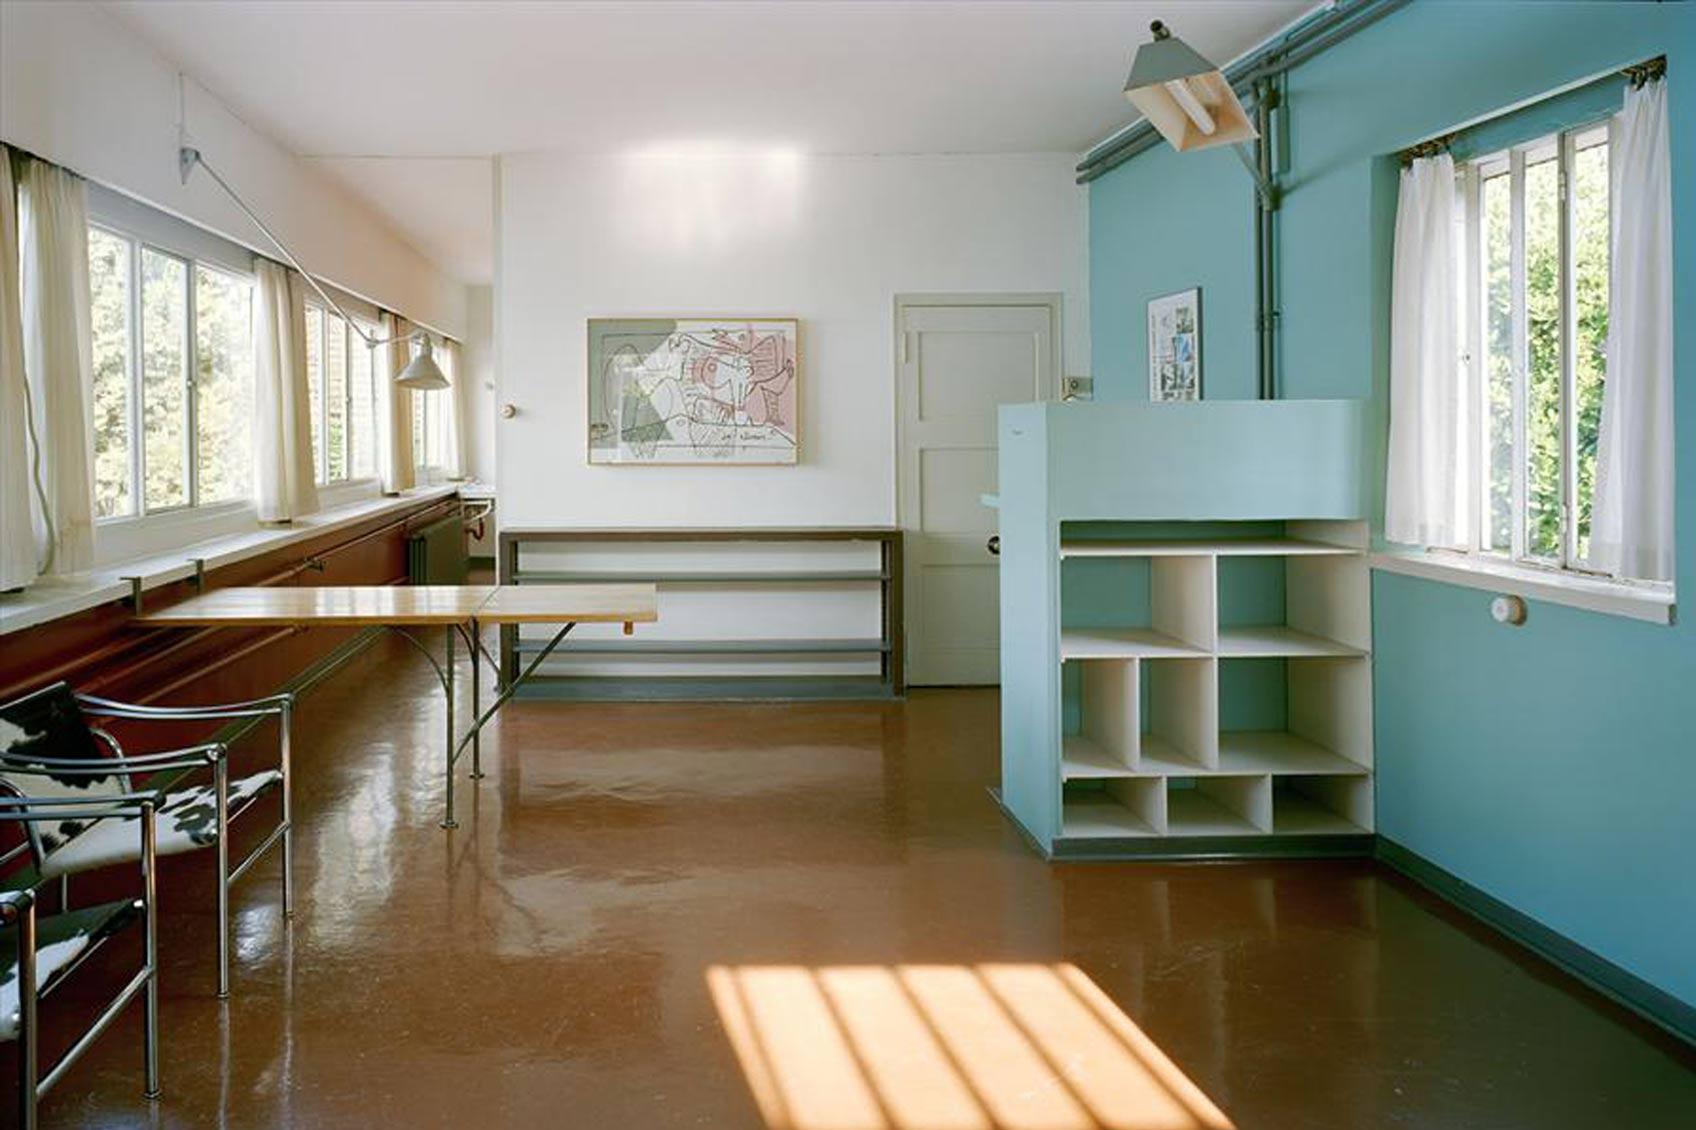 villa le lac le corbusier. Black Bedroom Furniture Sets. Home Design Ideas